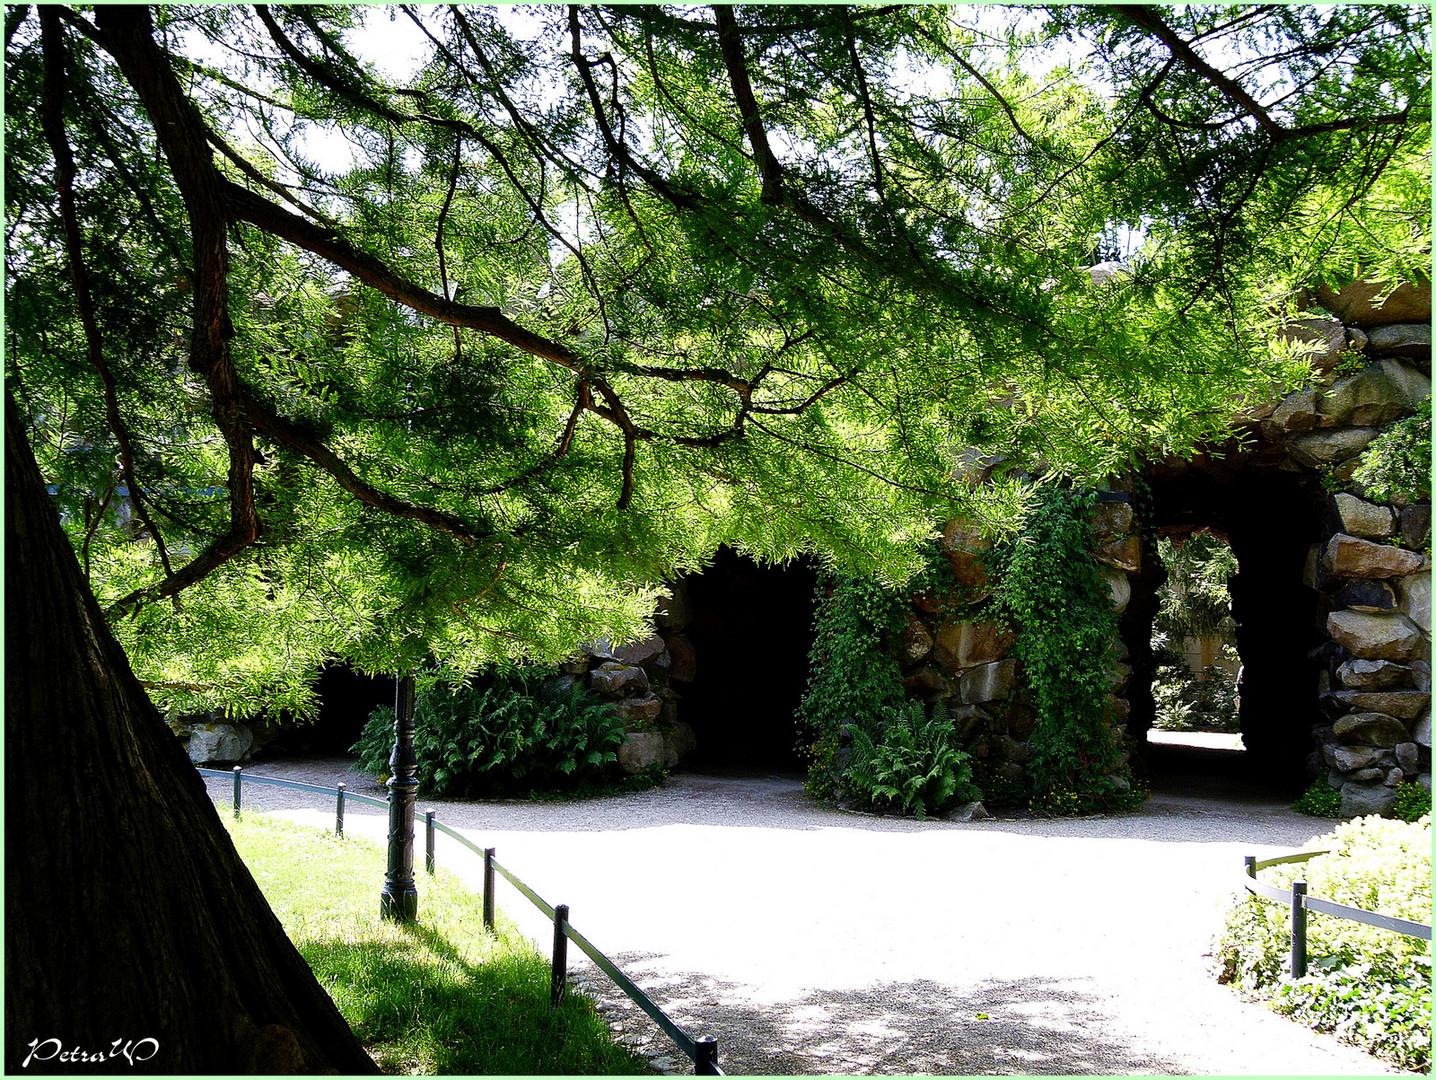 Grotte unter dem Schweriner Schloss